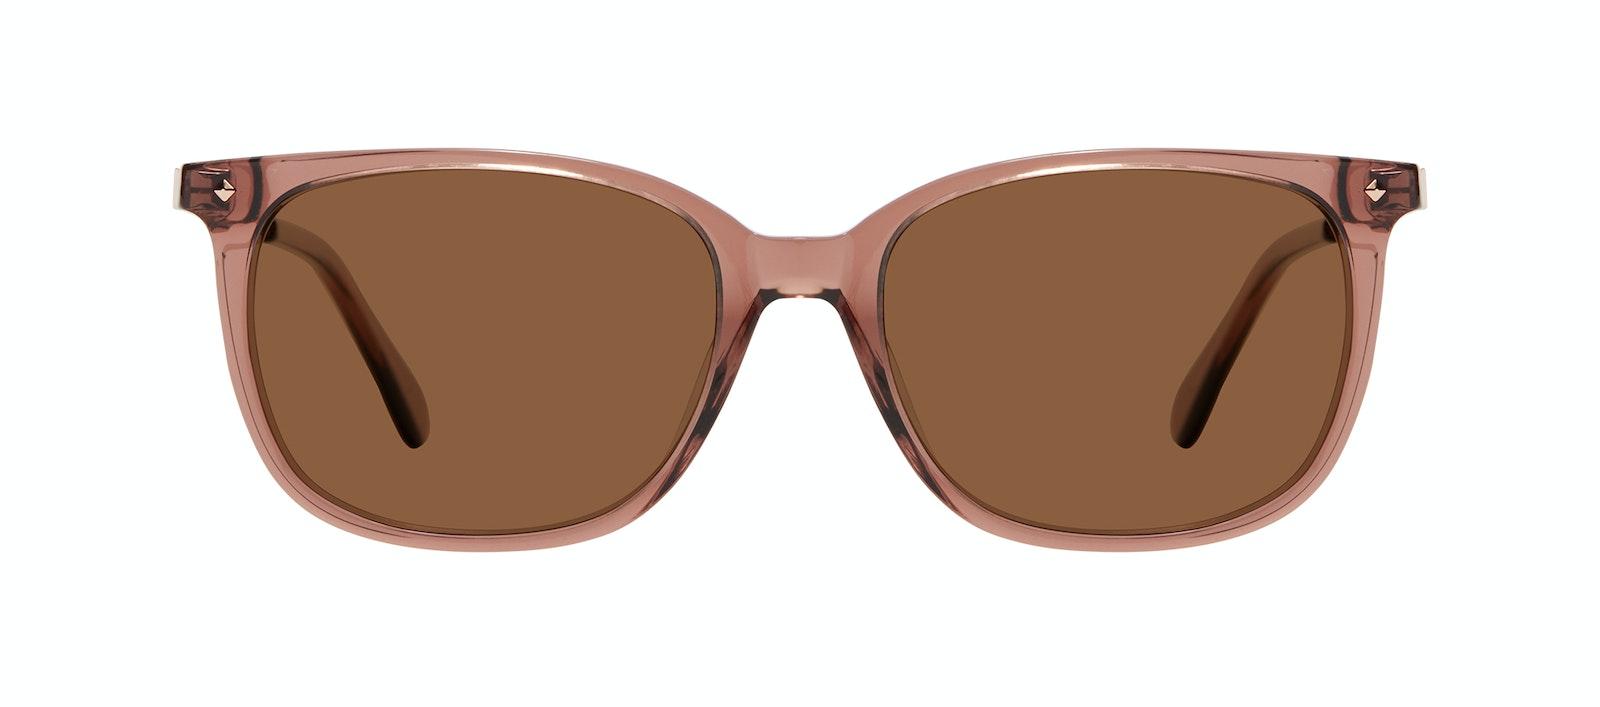 Affordable Fashion Glasses Rectangle Square Sunglasses Women Refine Dark Terra Front